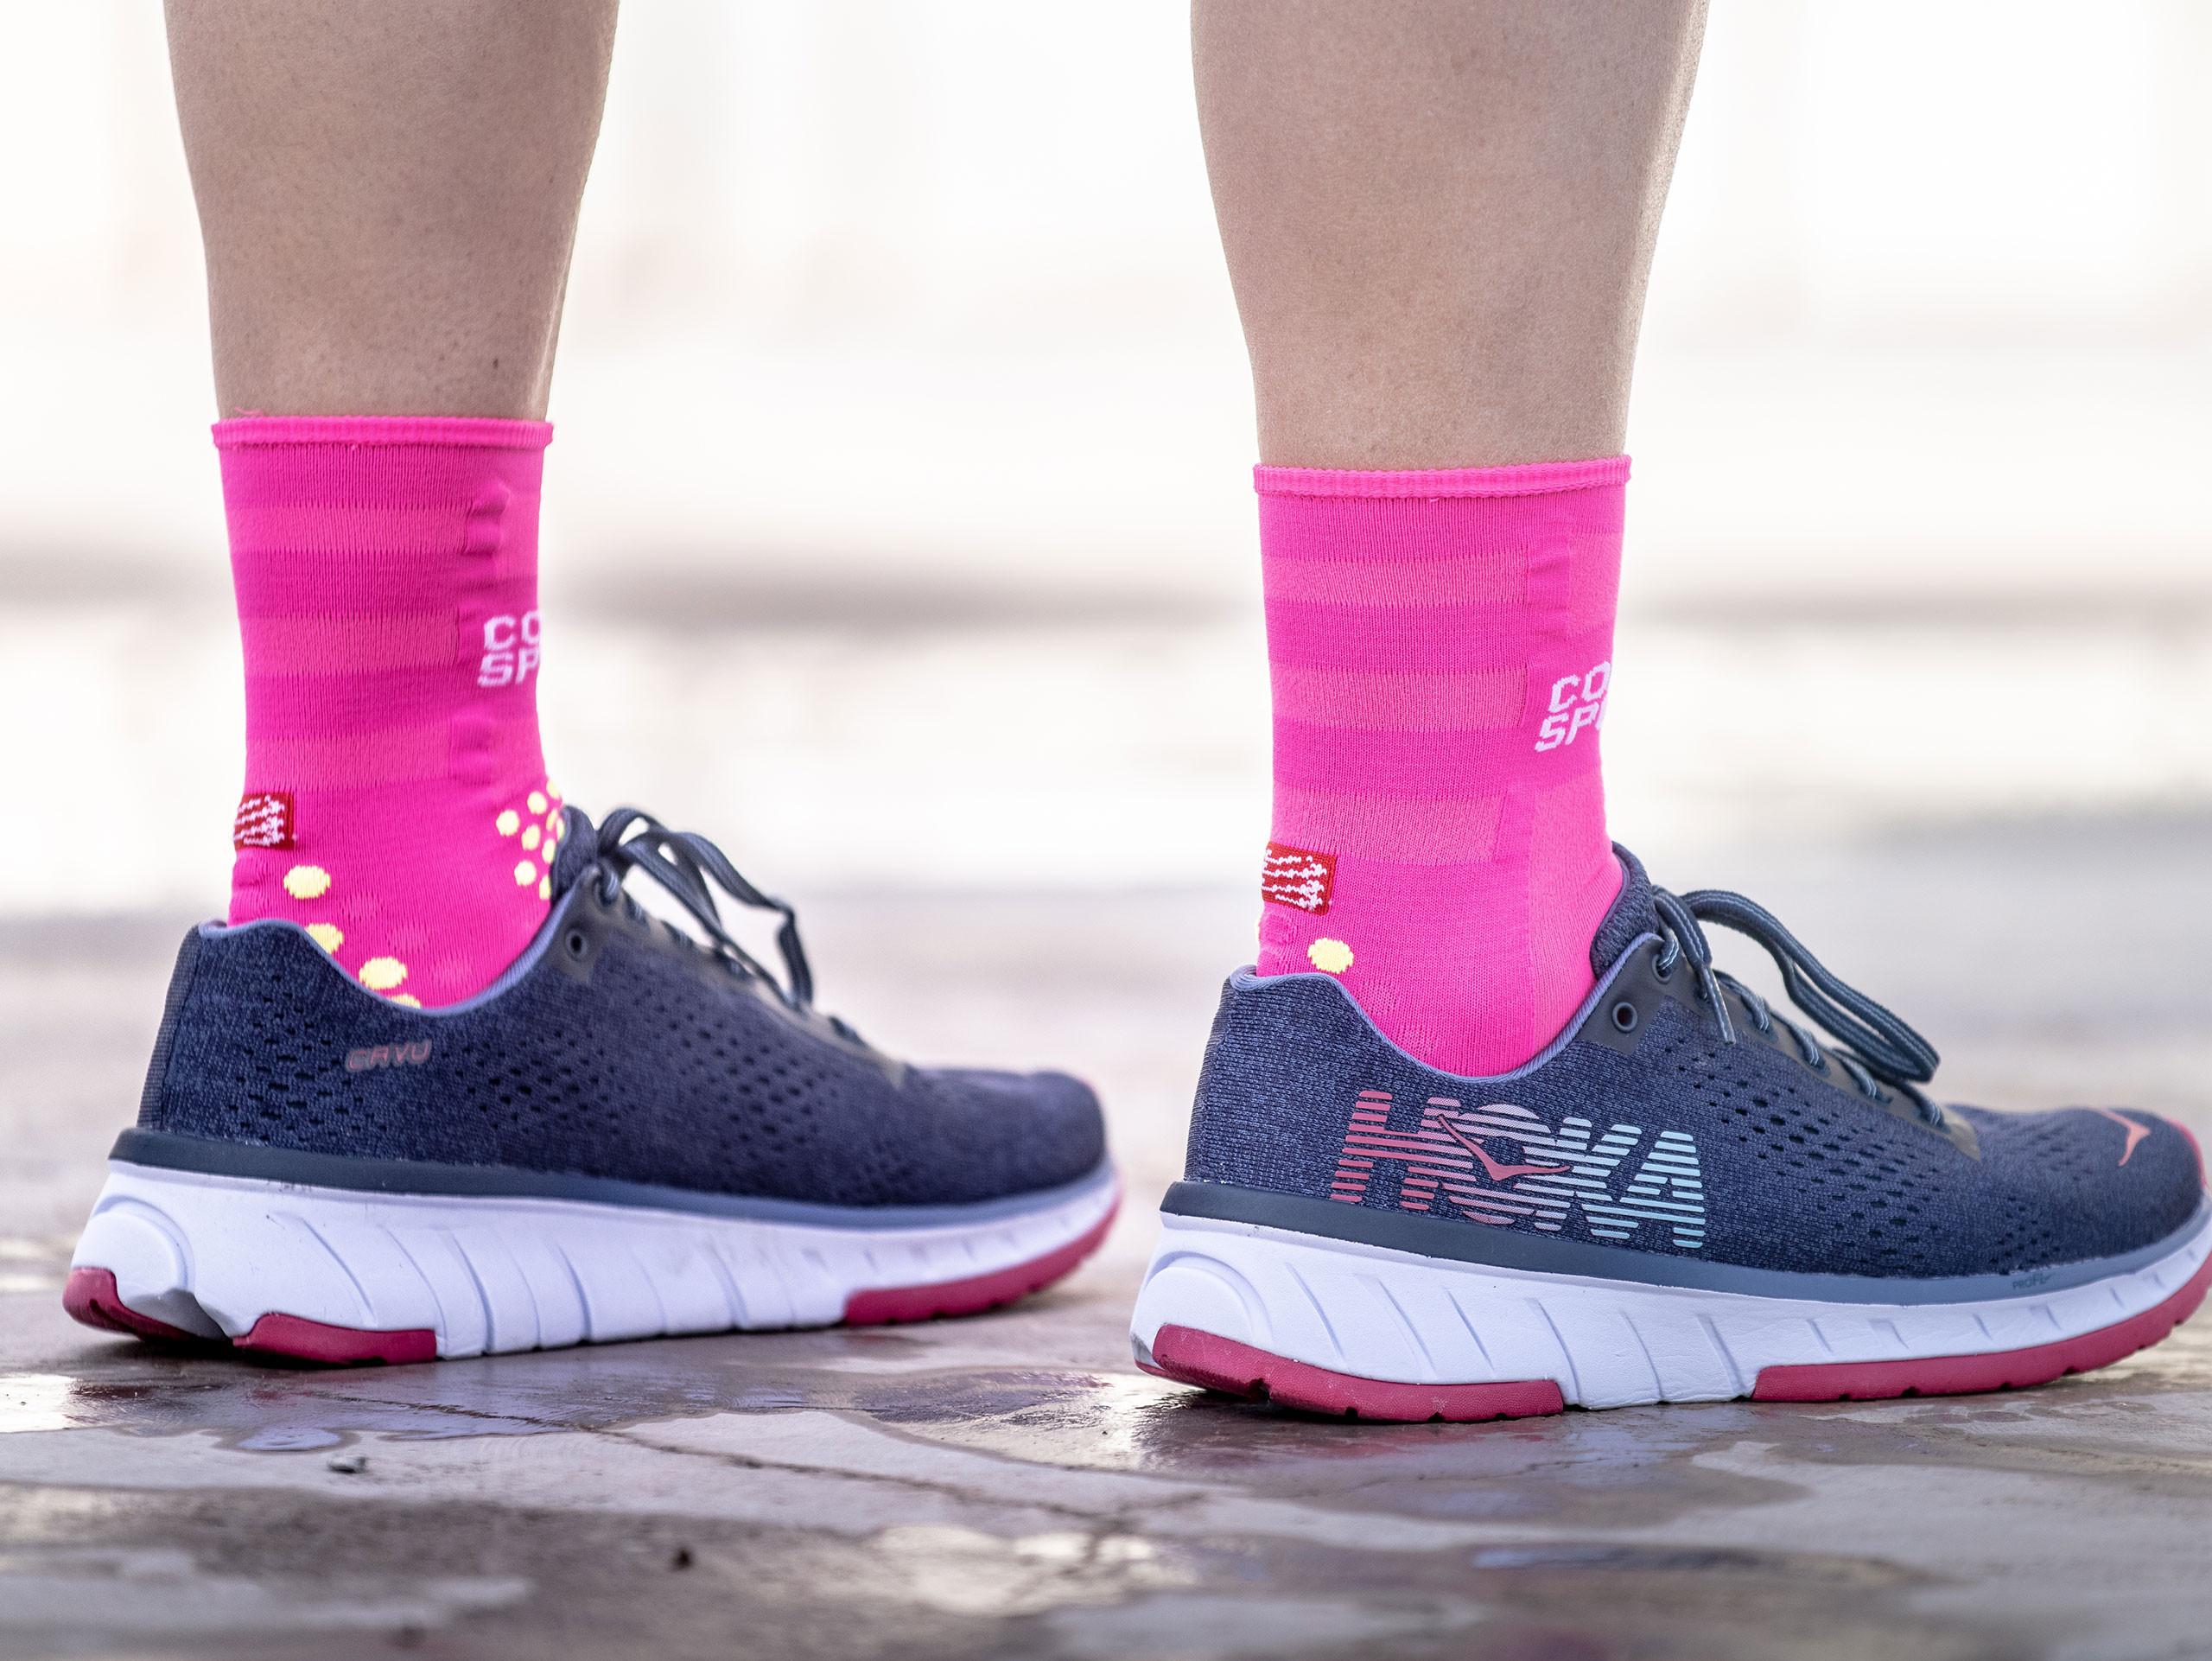 Pro Racing Socks v3.0 Run Ultralight Run High neonpink